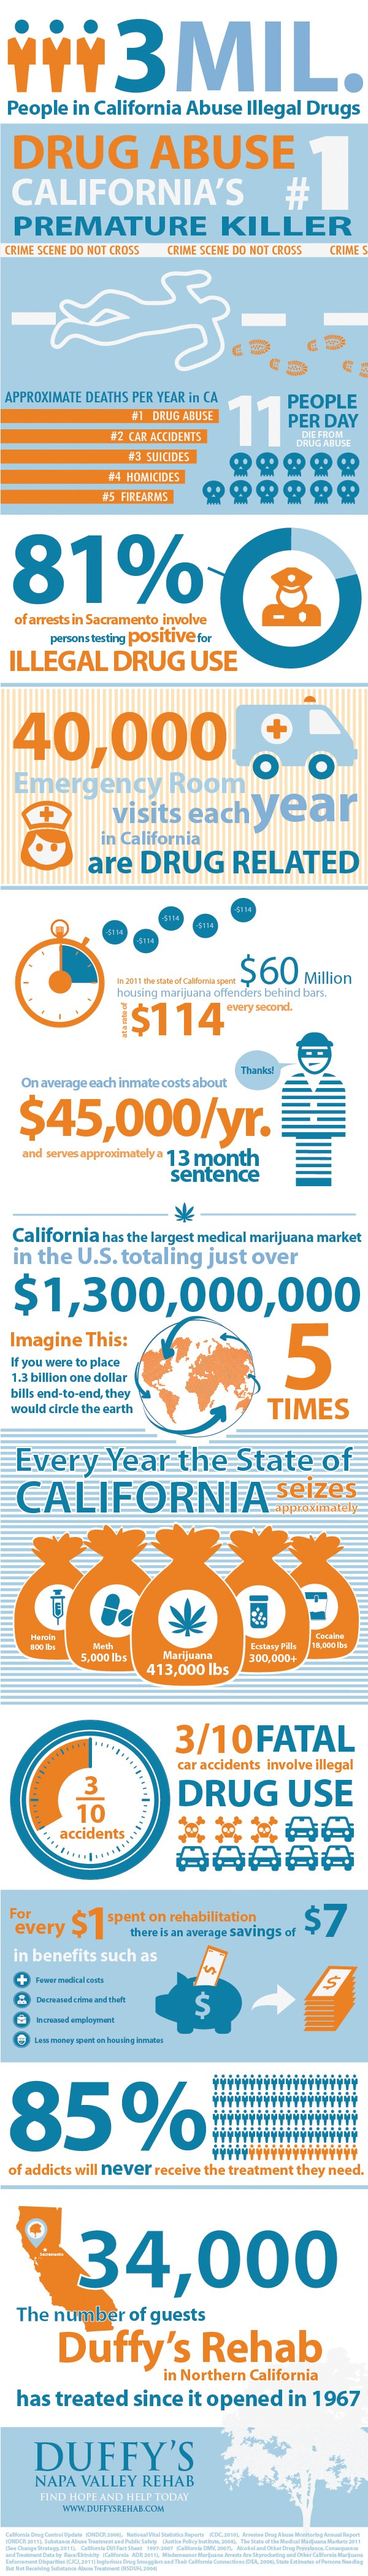 california-drug-abuse-statistics_50b905e4324ac